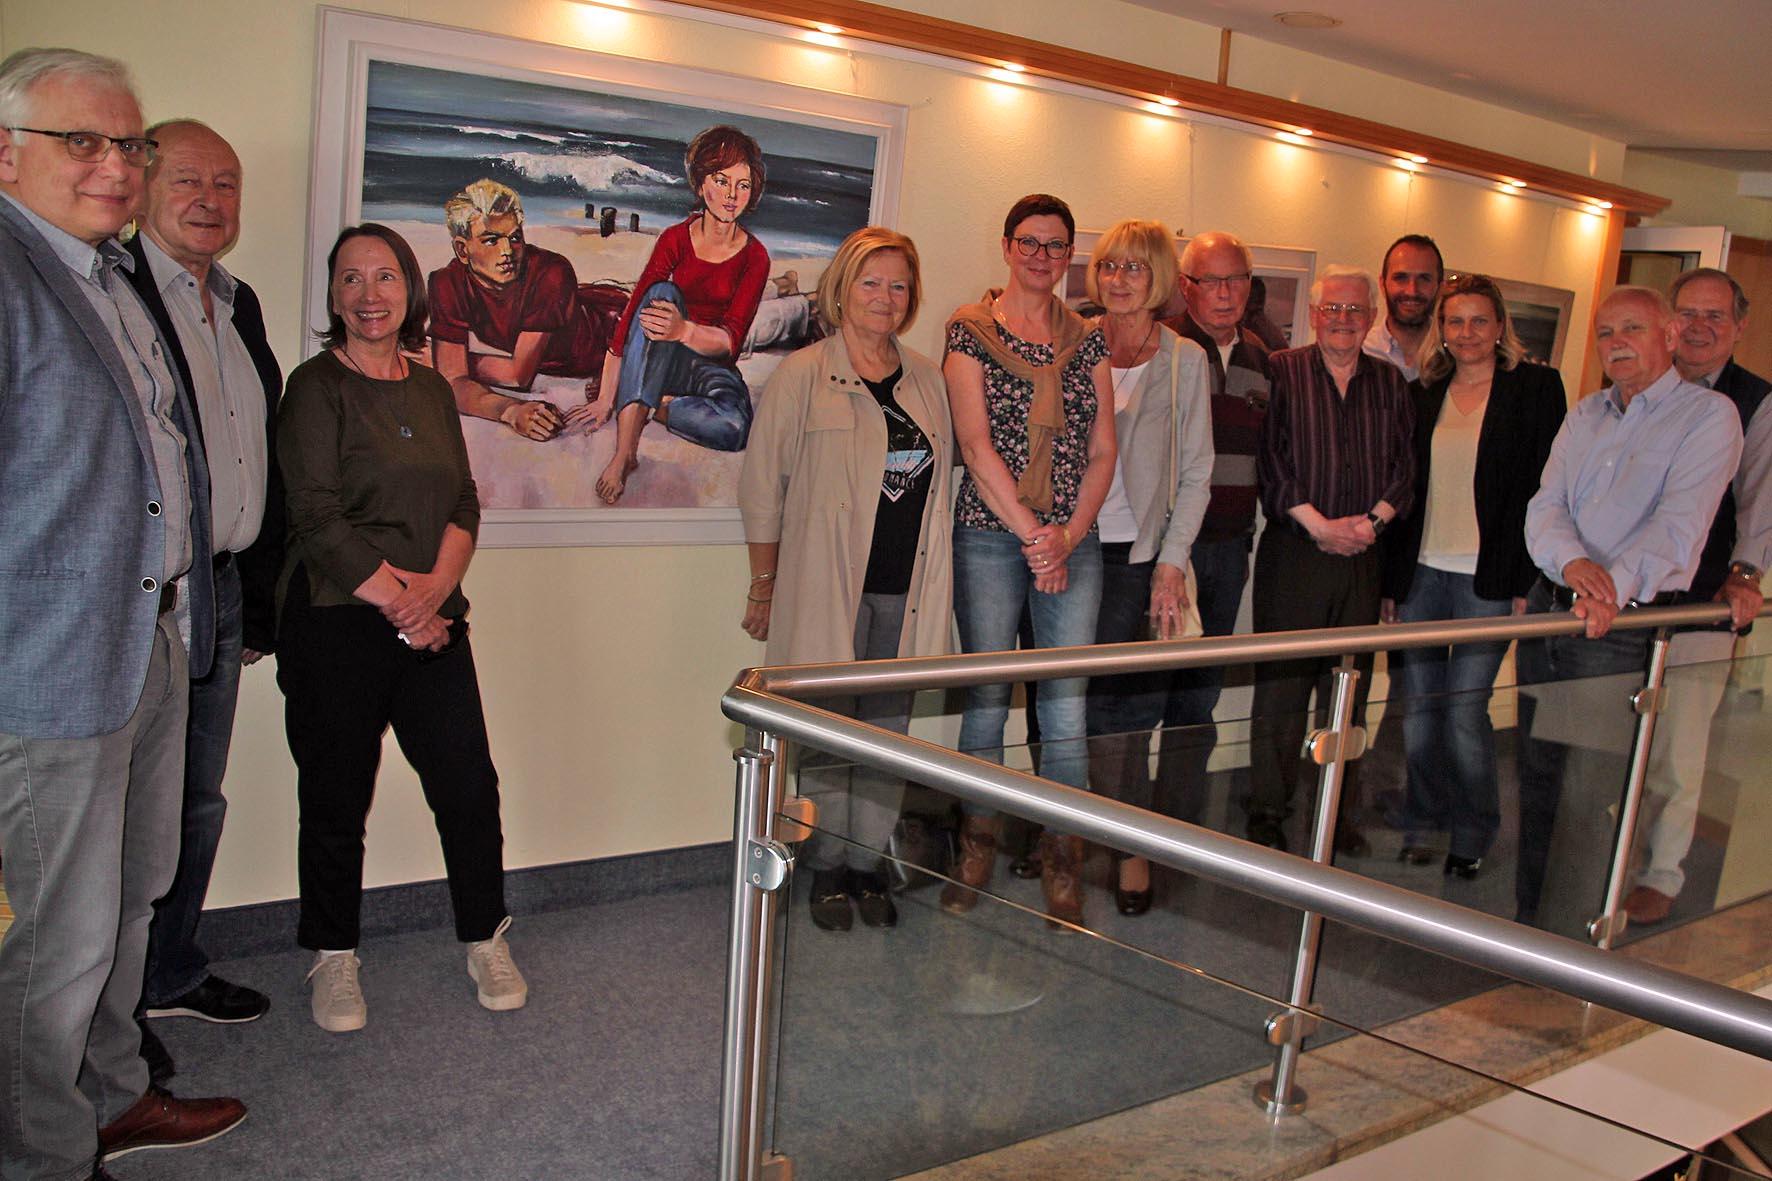 Freundeskreis plant Schaffung einer Walter-Womacka-Künstlerbegegnungsstätte